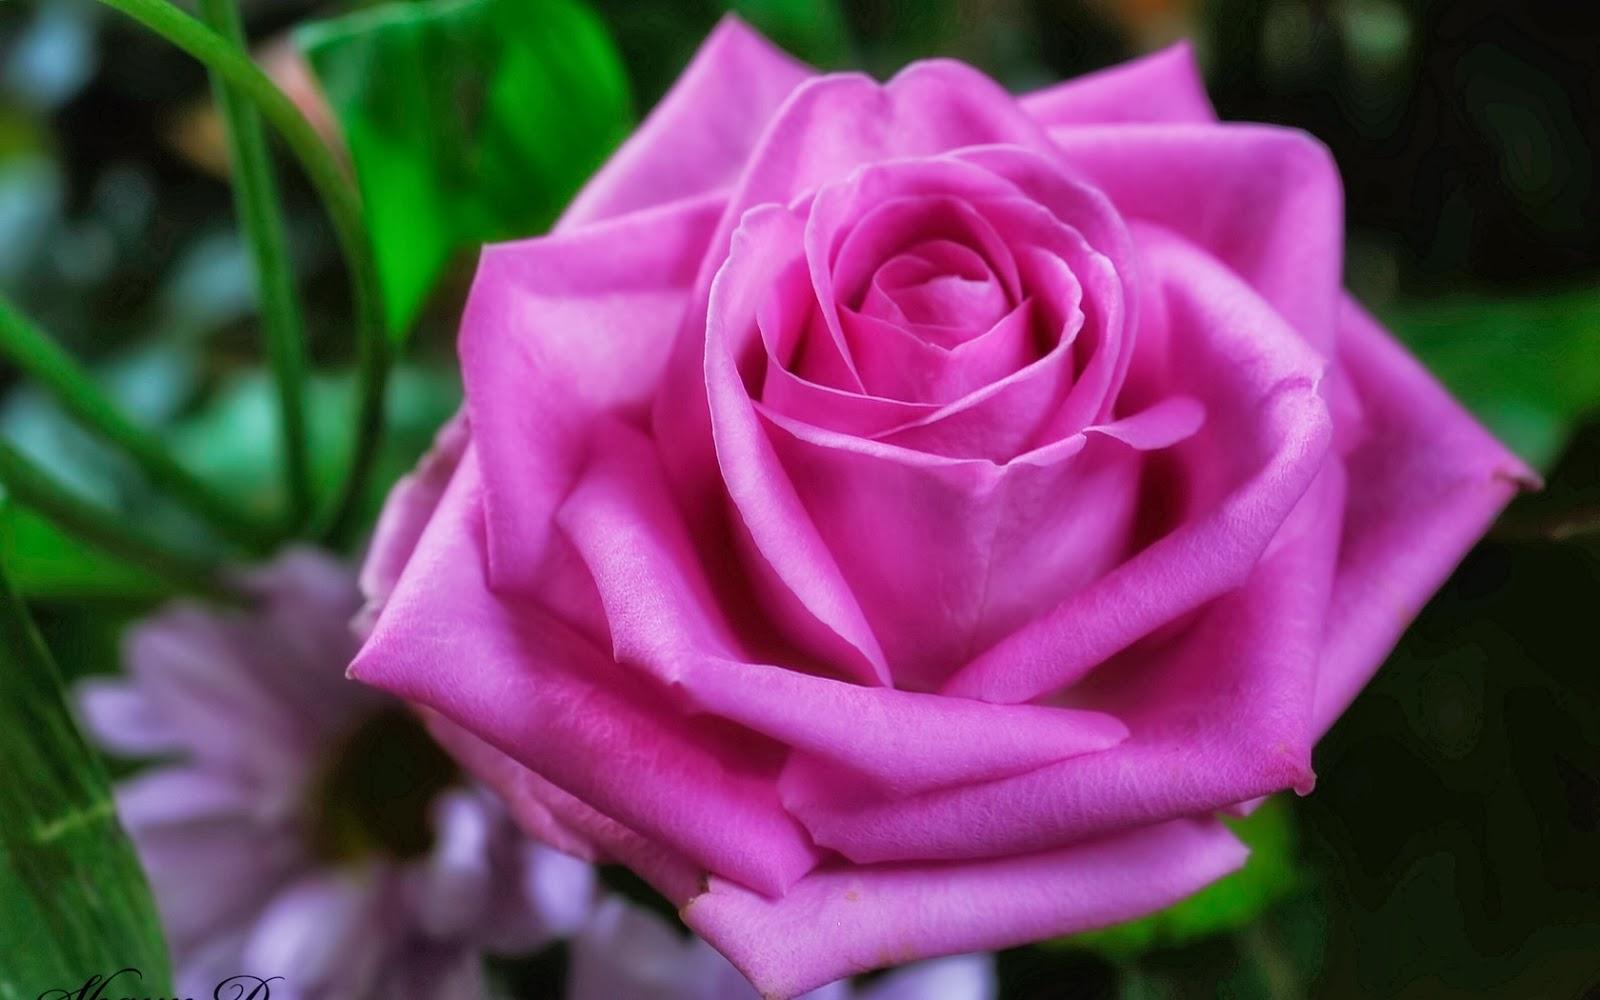 Imagenes hd de rosas hermosas imagui - Rosas rosas hermosas ...